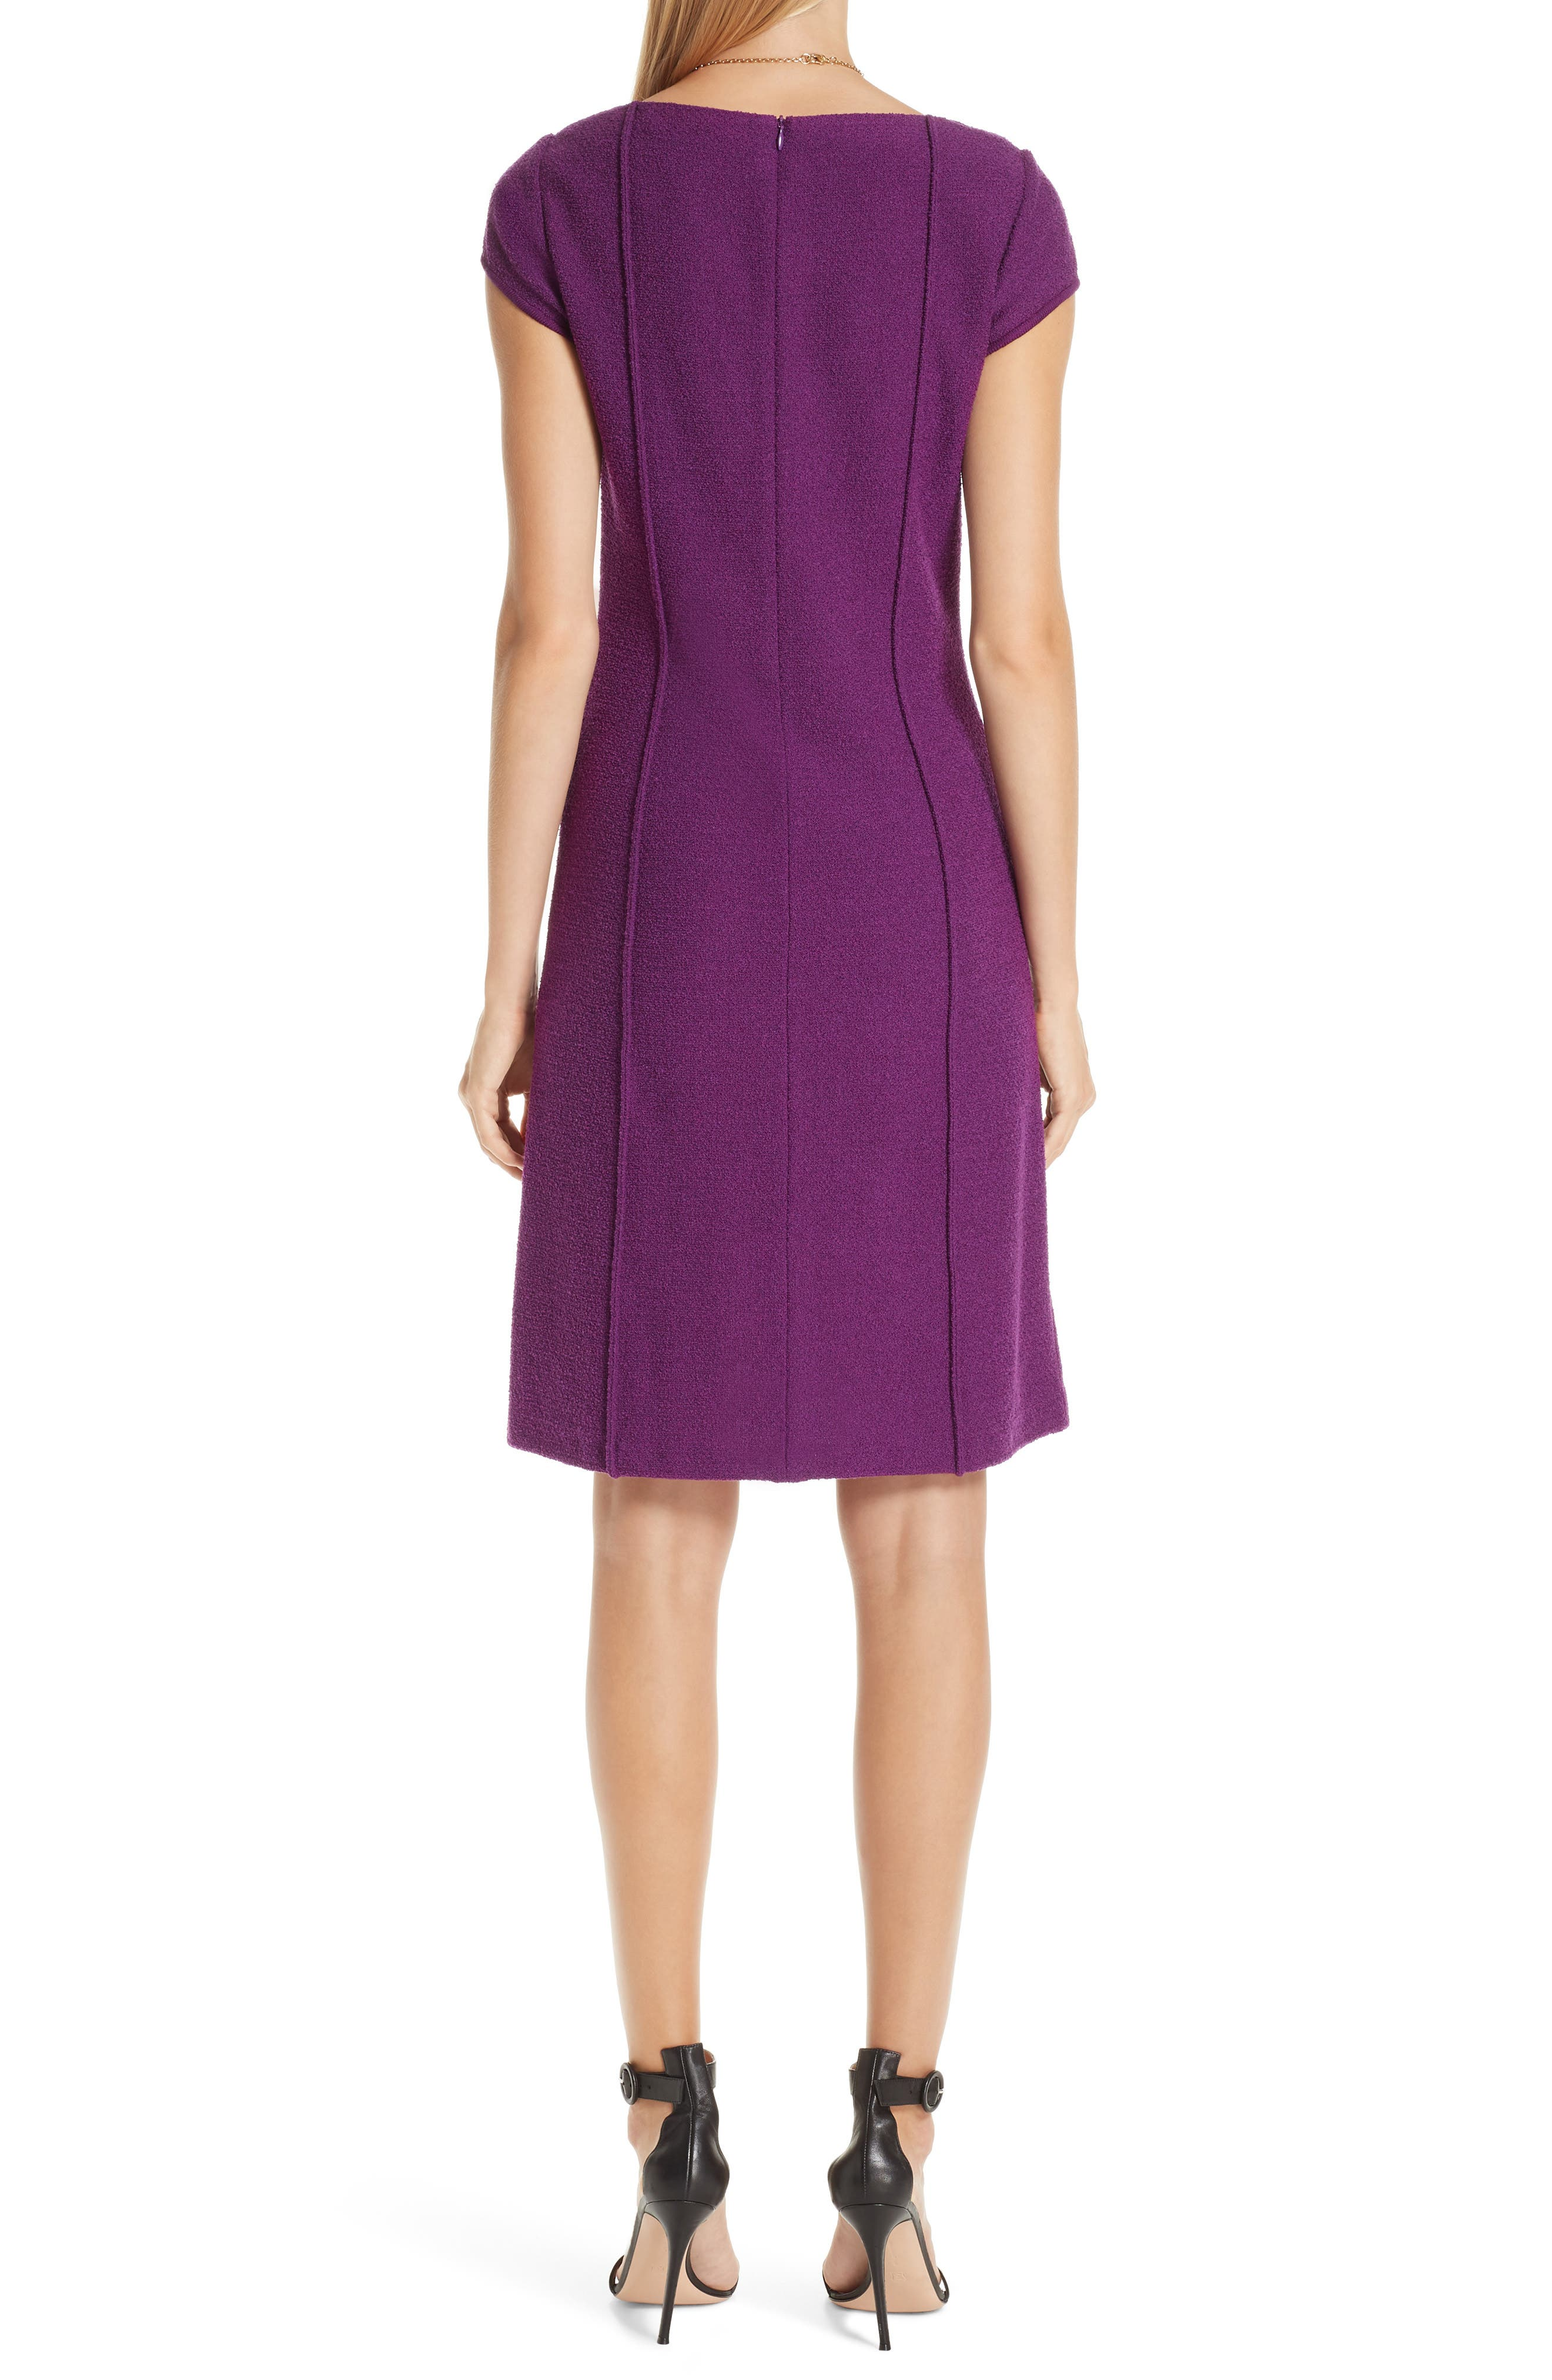 Ana Boucle Knit Sheath Dress in Iris